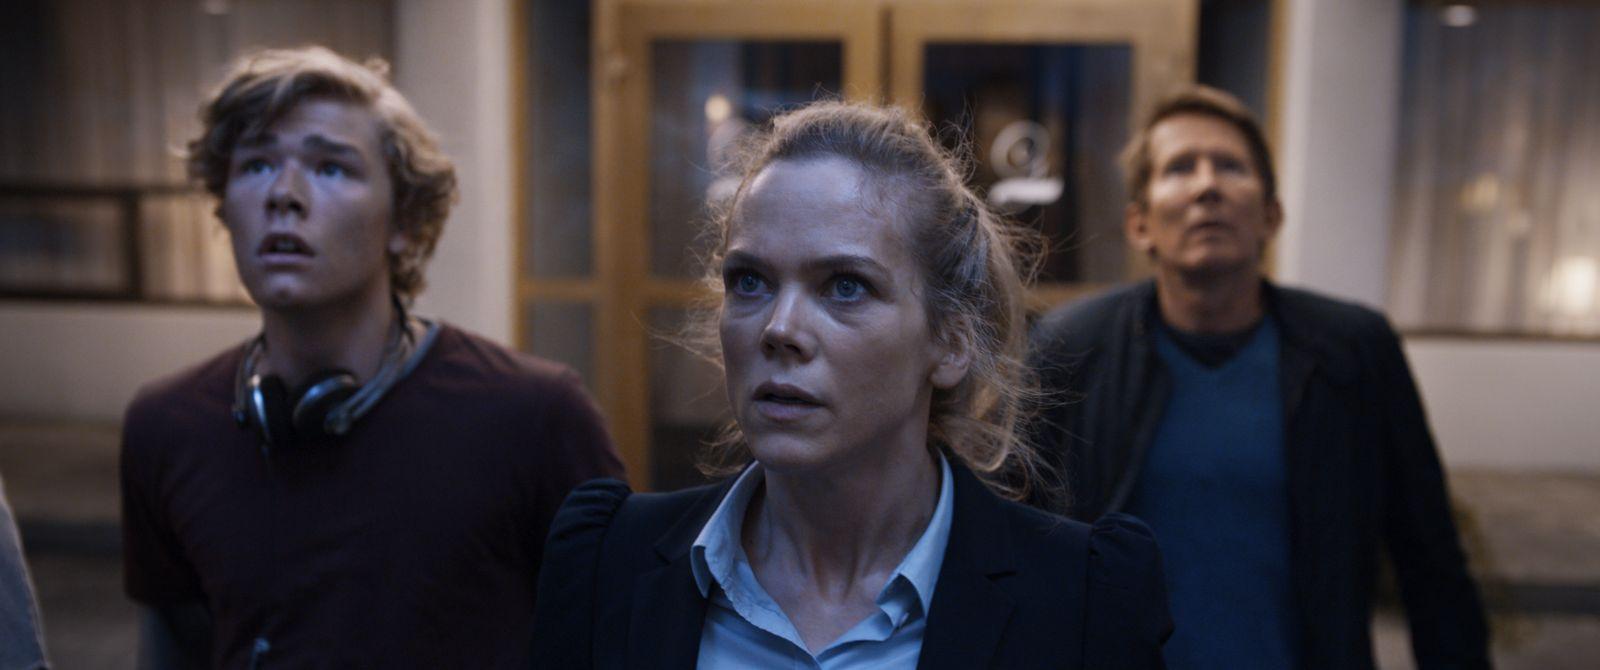 The Wave: un'immagine tratta dal disaster movie norvegese